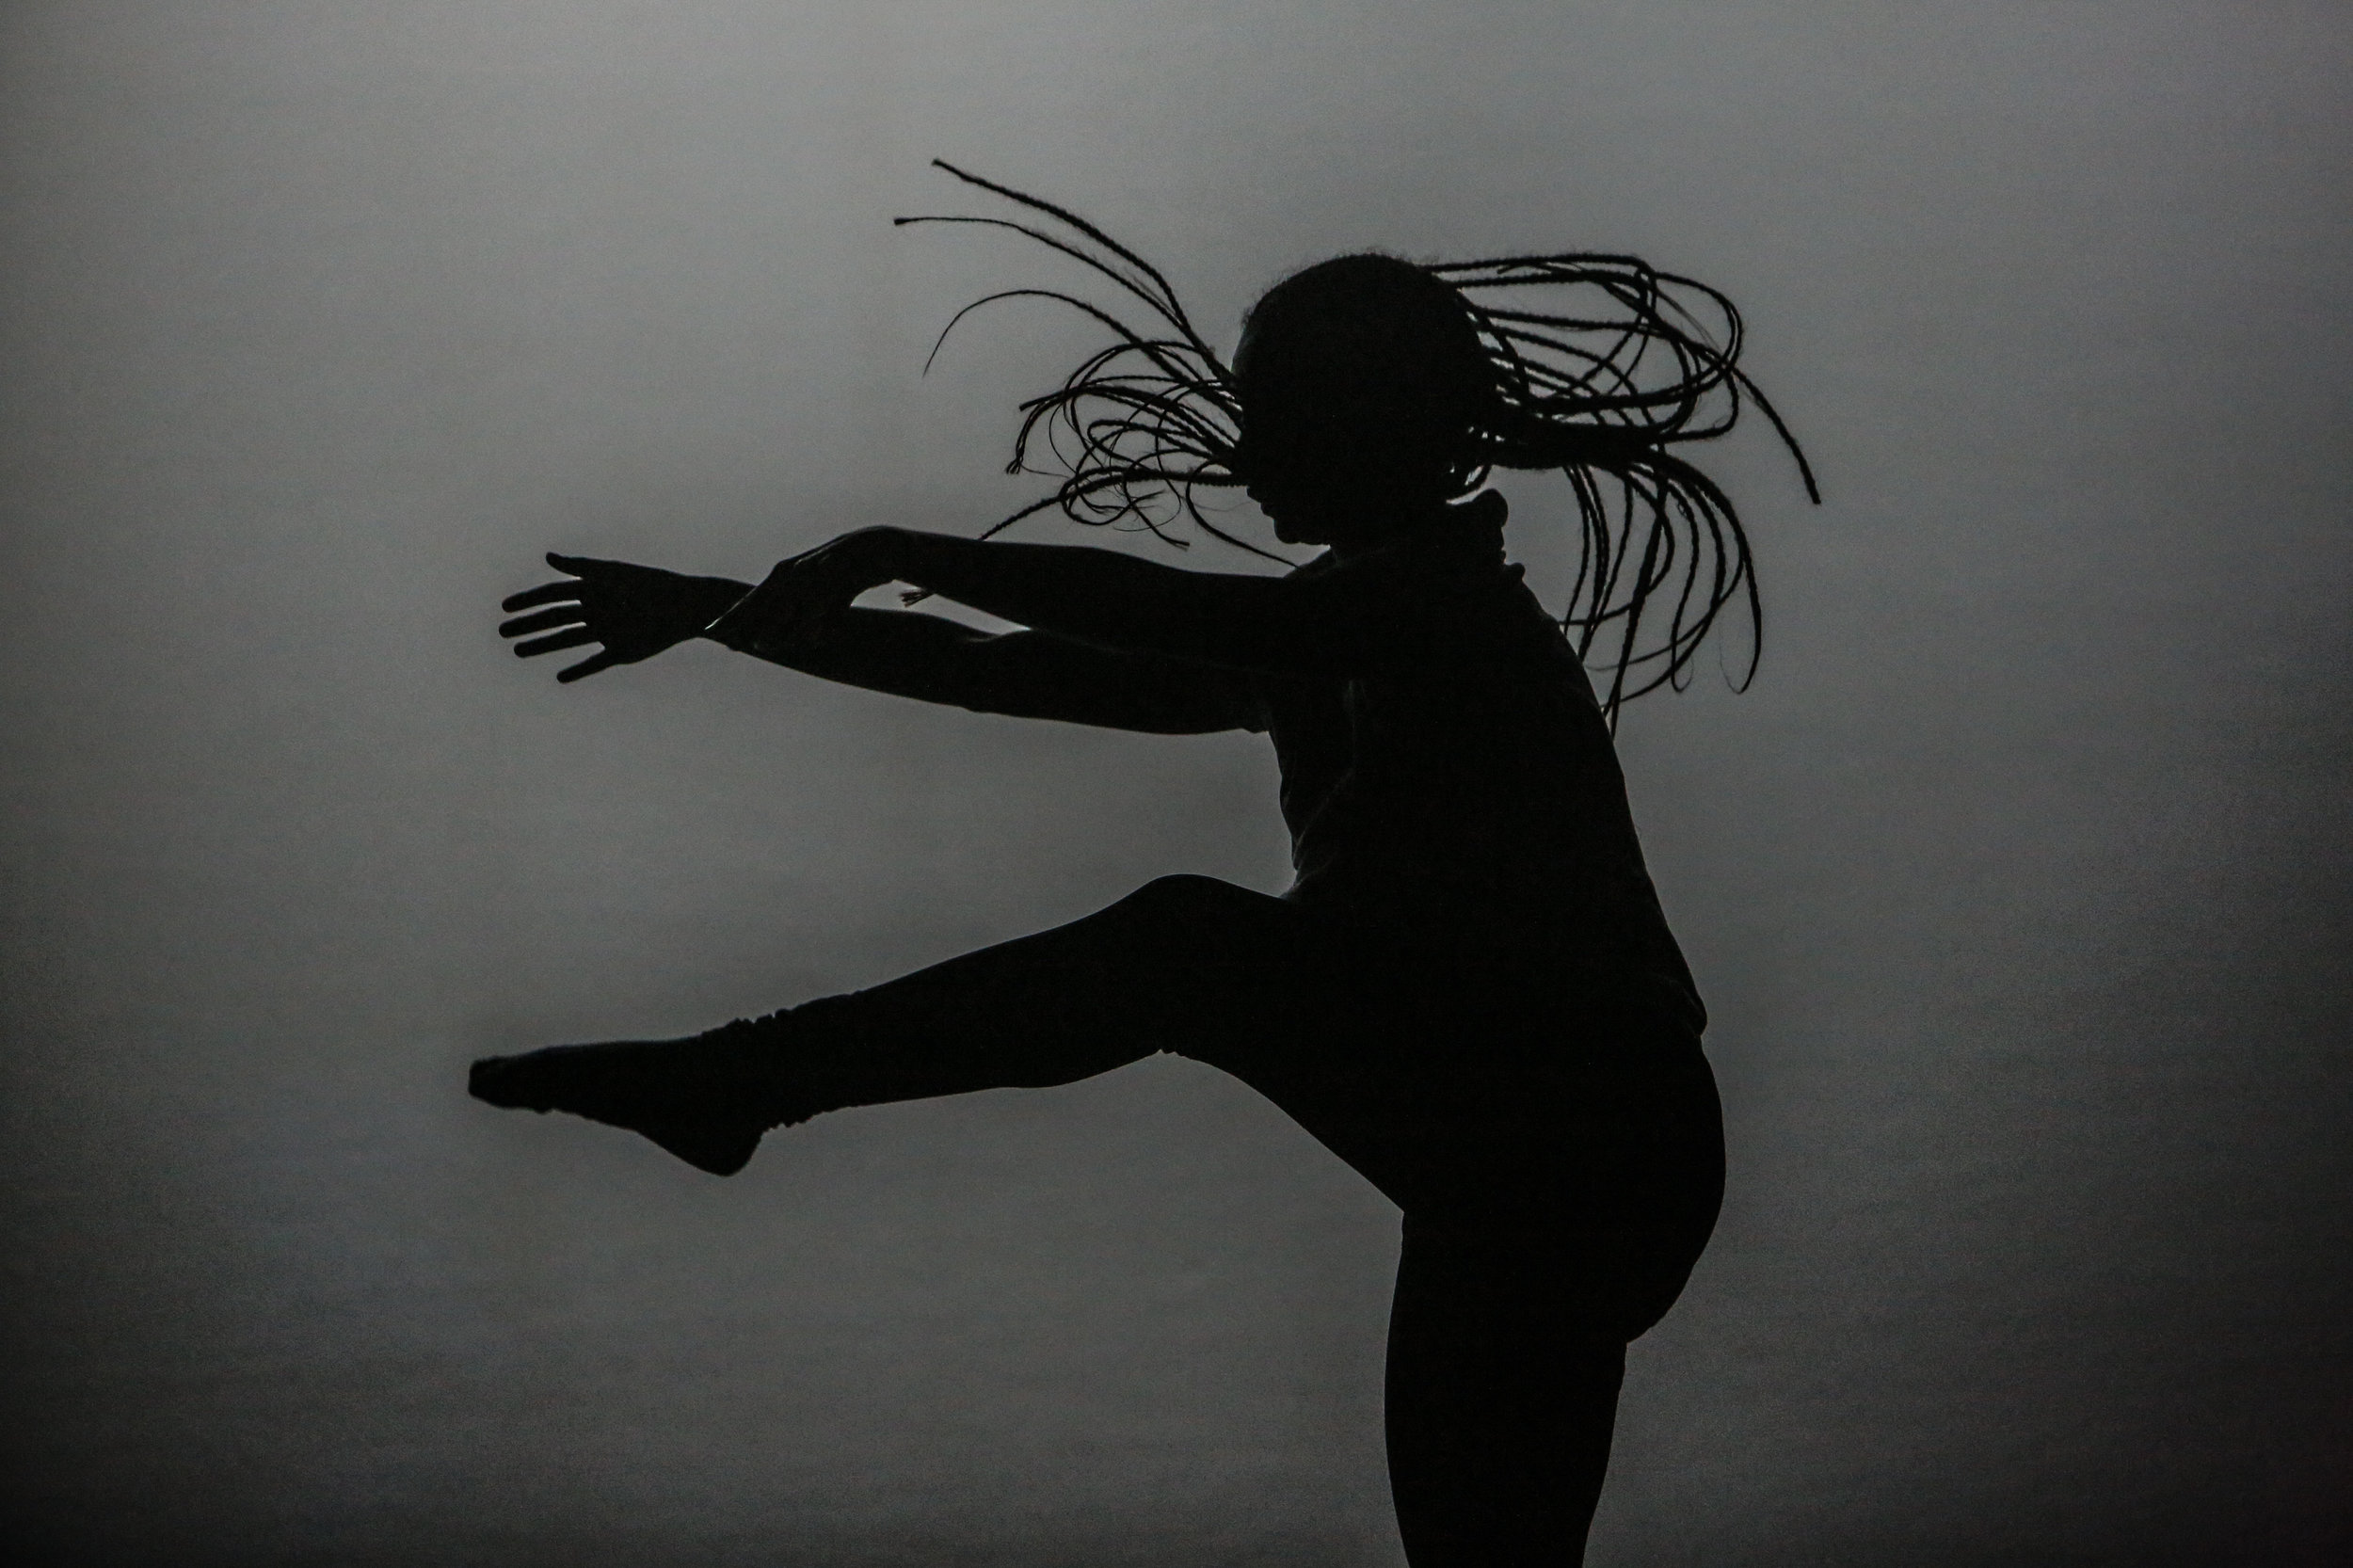 BHSdanceBHSdanceBHS dance5B0A6386004060060900135.jpg